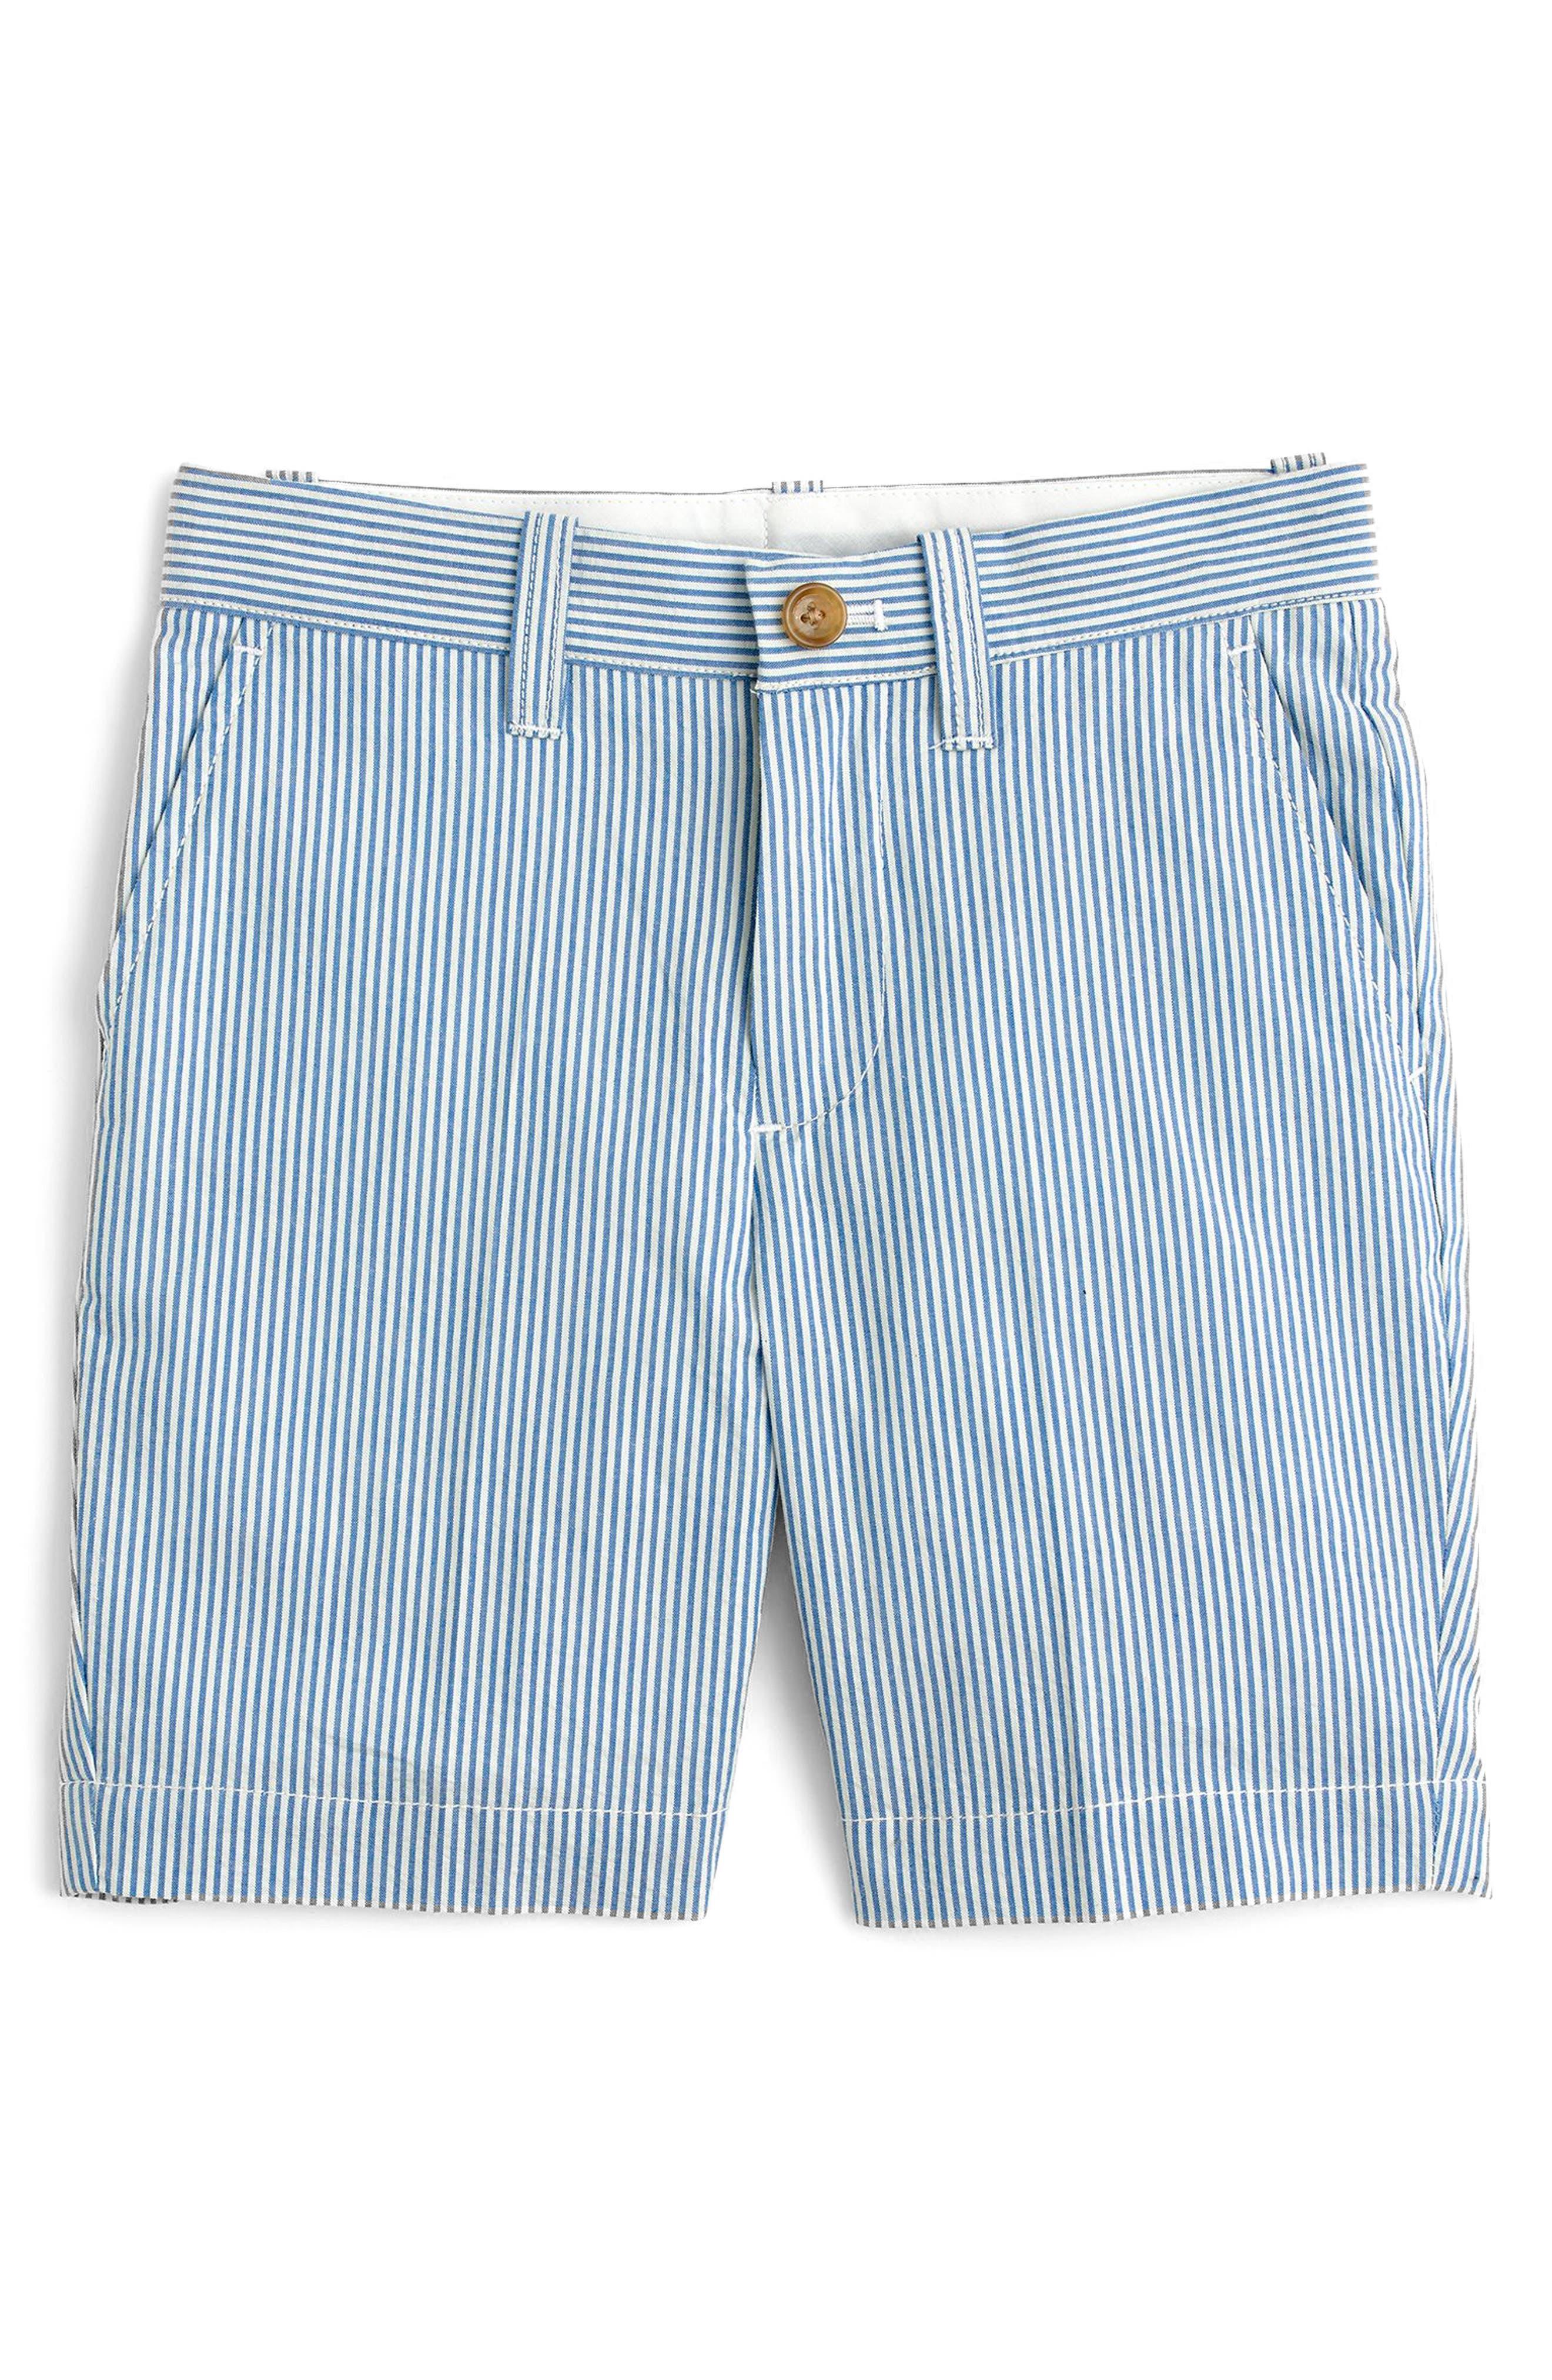 Seersucker Shorts,                             Main thumbnail 1, color,